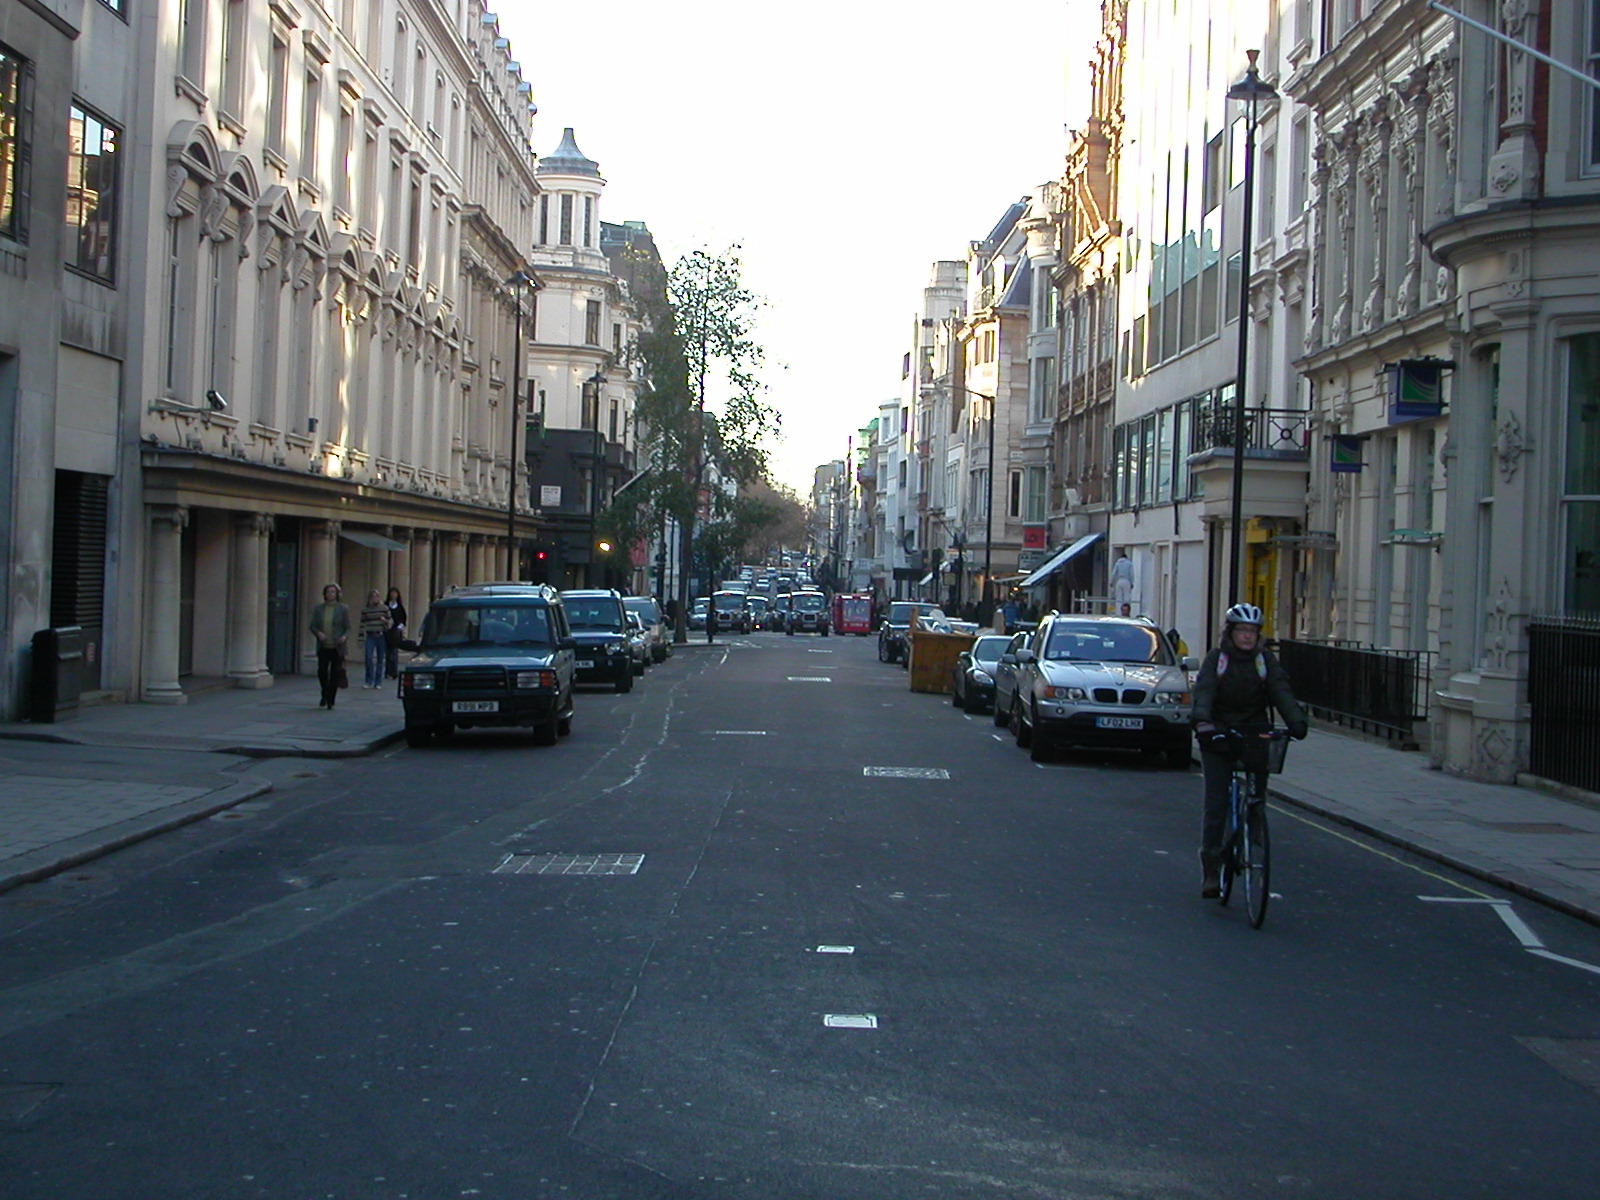 File:Brook Street (W).jpg - Wikipedia, the free encyclopedia